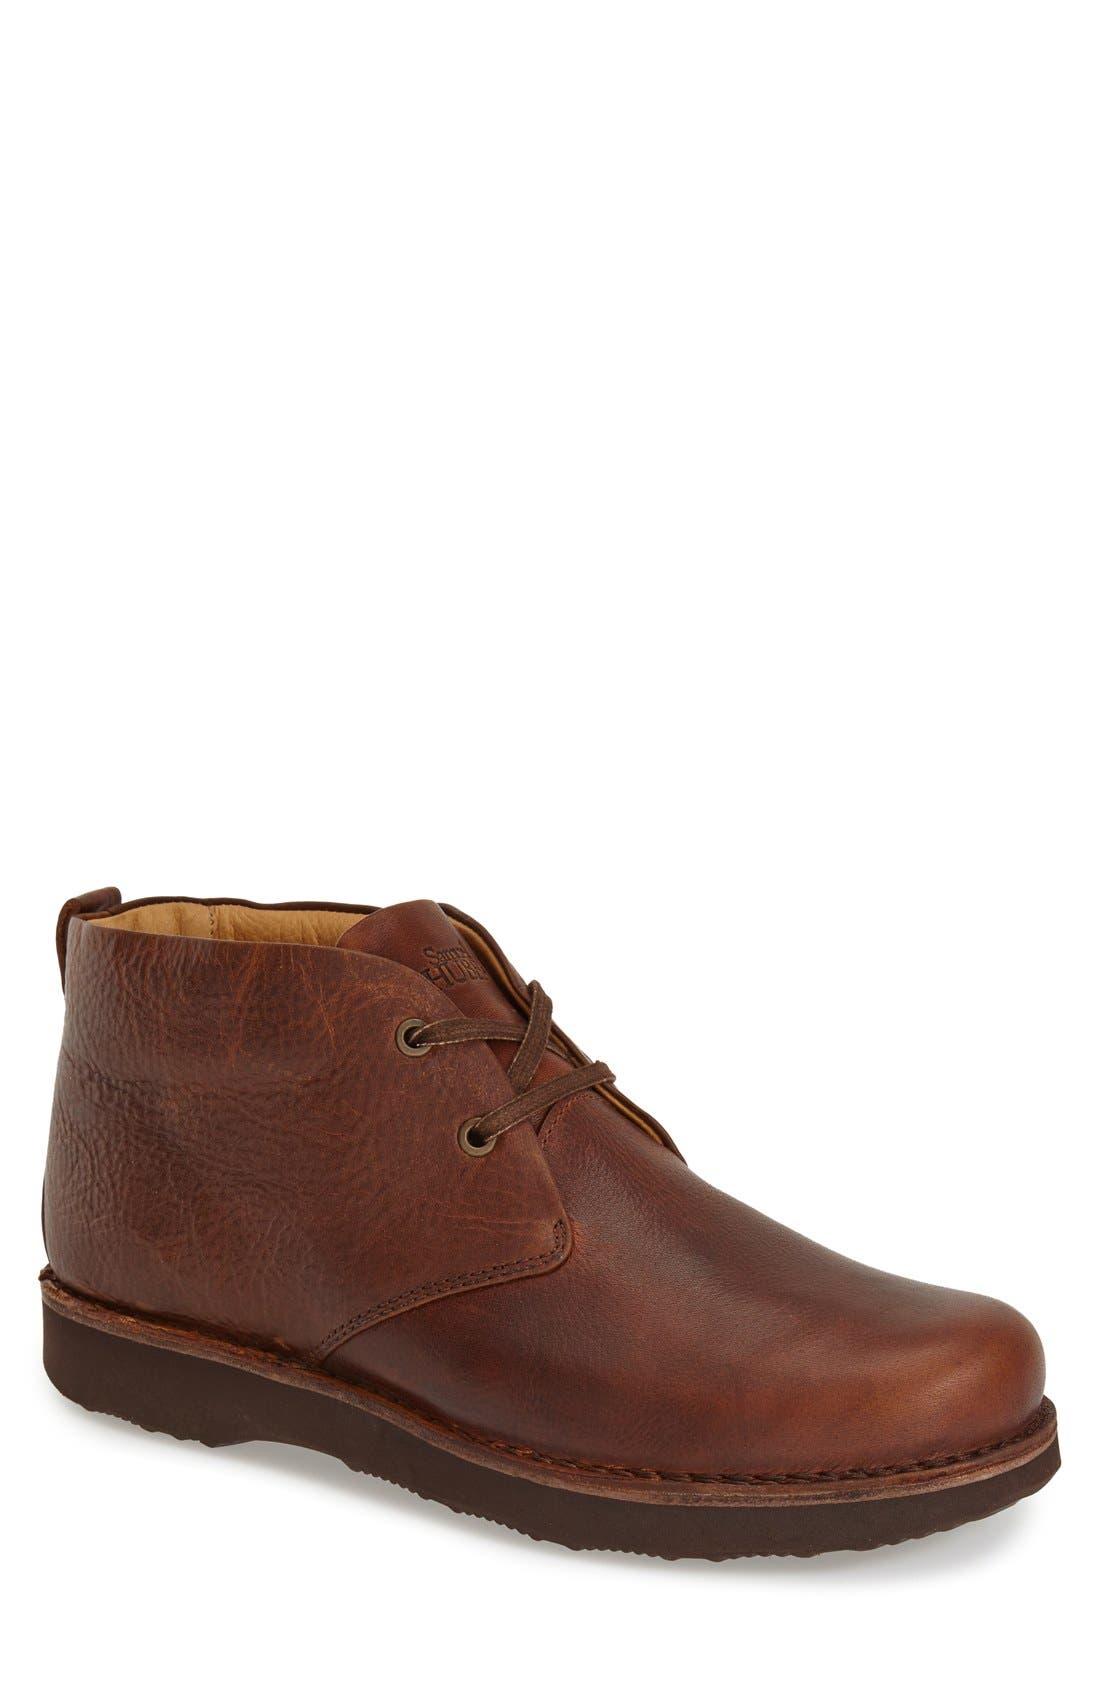 Alternate Image 1 Selected - Samuel Hubbard 'Boot-Up' Chukka Boot (Men)